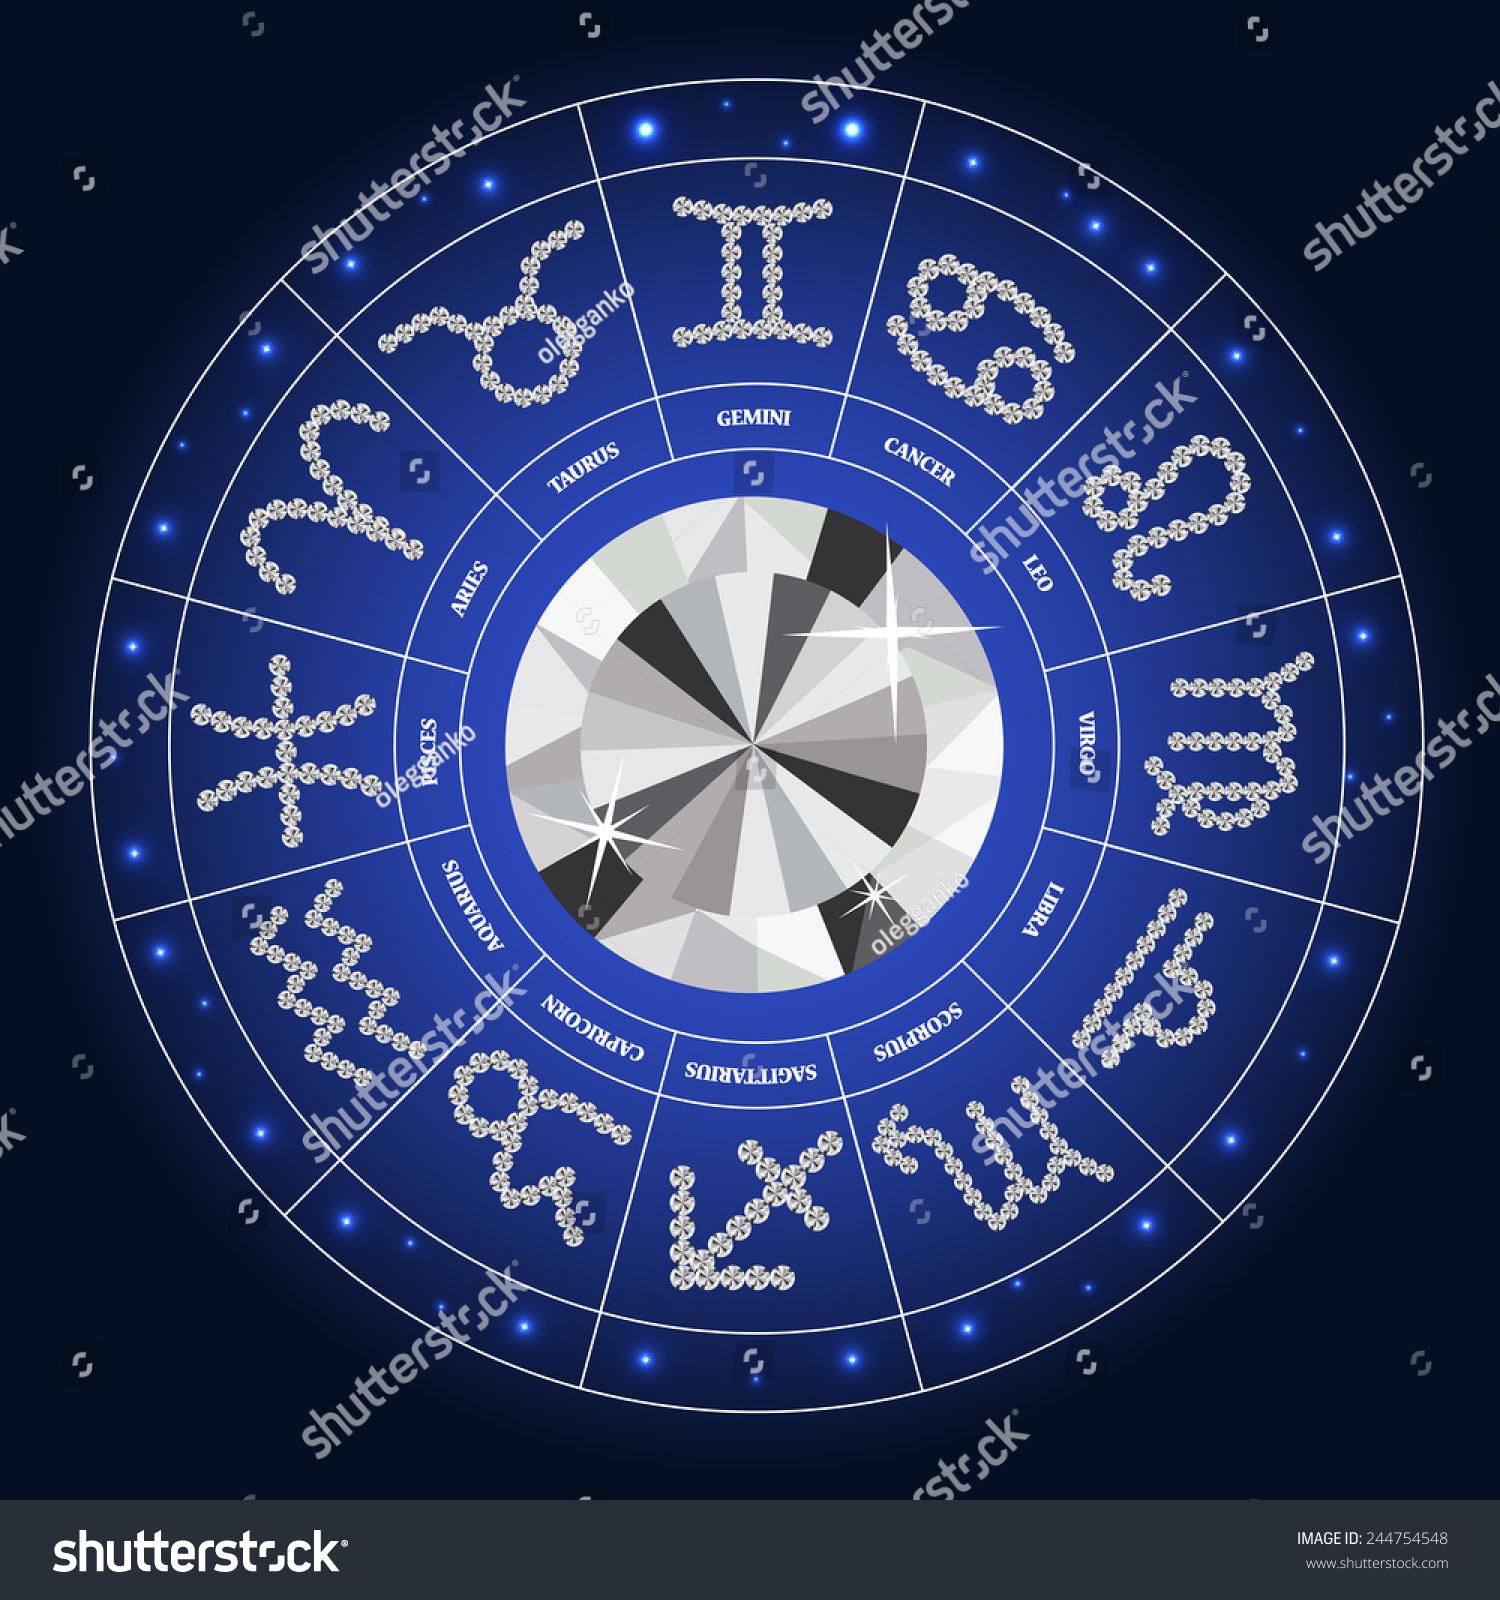 Set symbol zodiac sign diamond vector stock vector 244754548 set of symbol zodiac sign diamond vector illustration eps10 buycottarizona